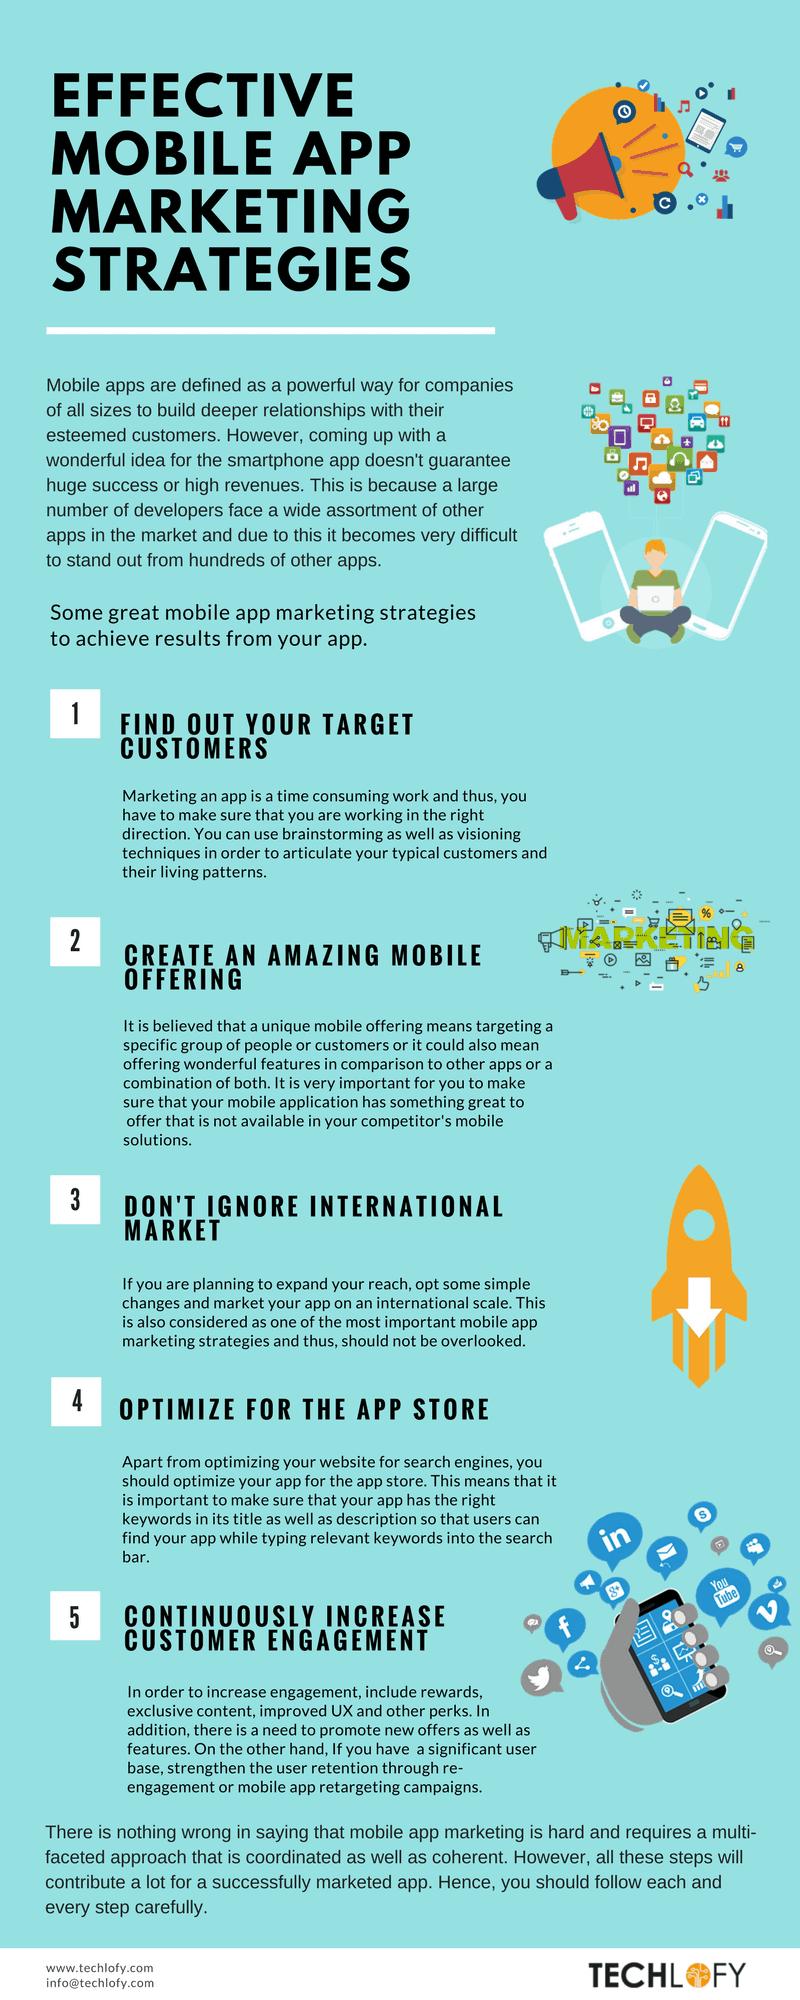 Mobile App Marketing Strategies - Infographic